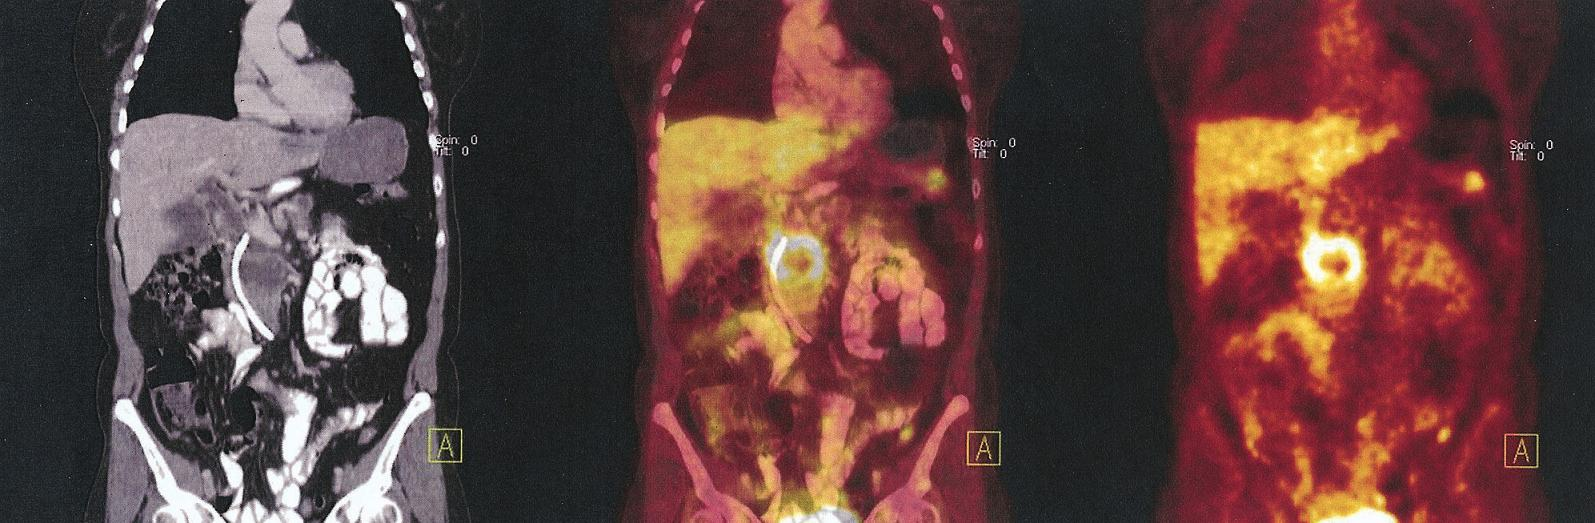 Benigní cystadenom kaudy pankreatu. V CT fázi ložisko v kaudě, bez korelátu v PET fázi Fig. 3. Benign cystadenoma of the cauda. The CT phasebearing in the cauda without correlate on the PET phase